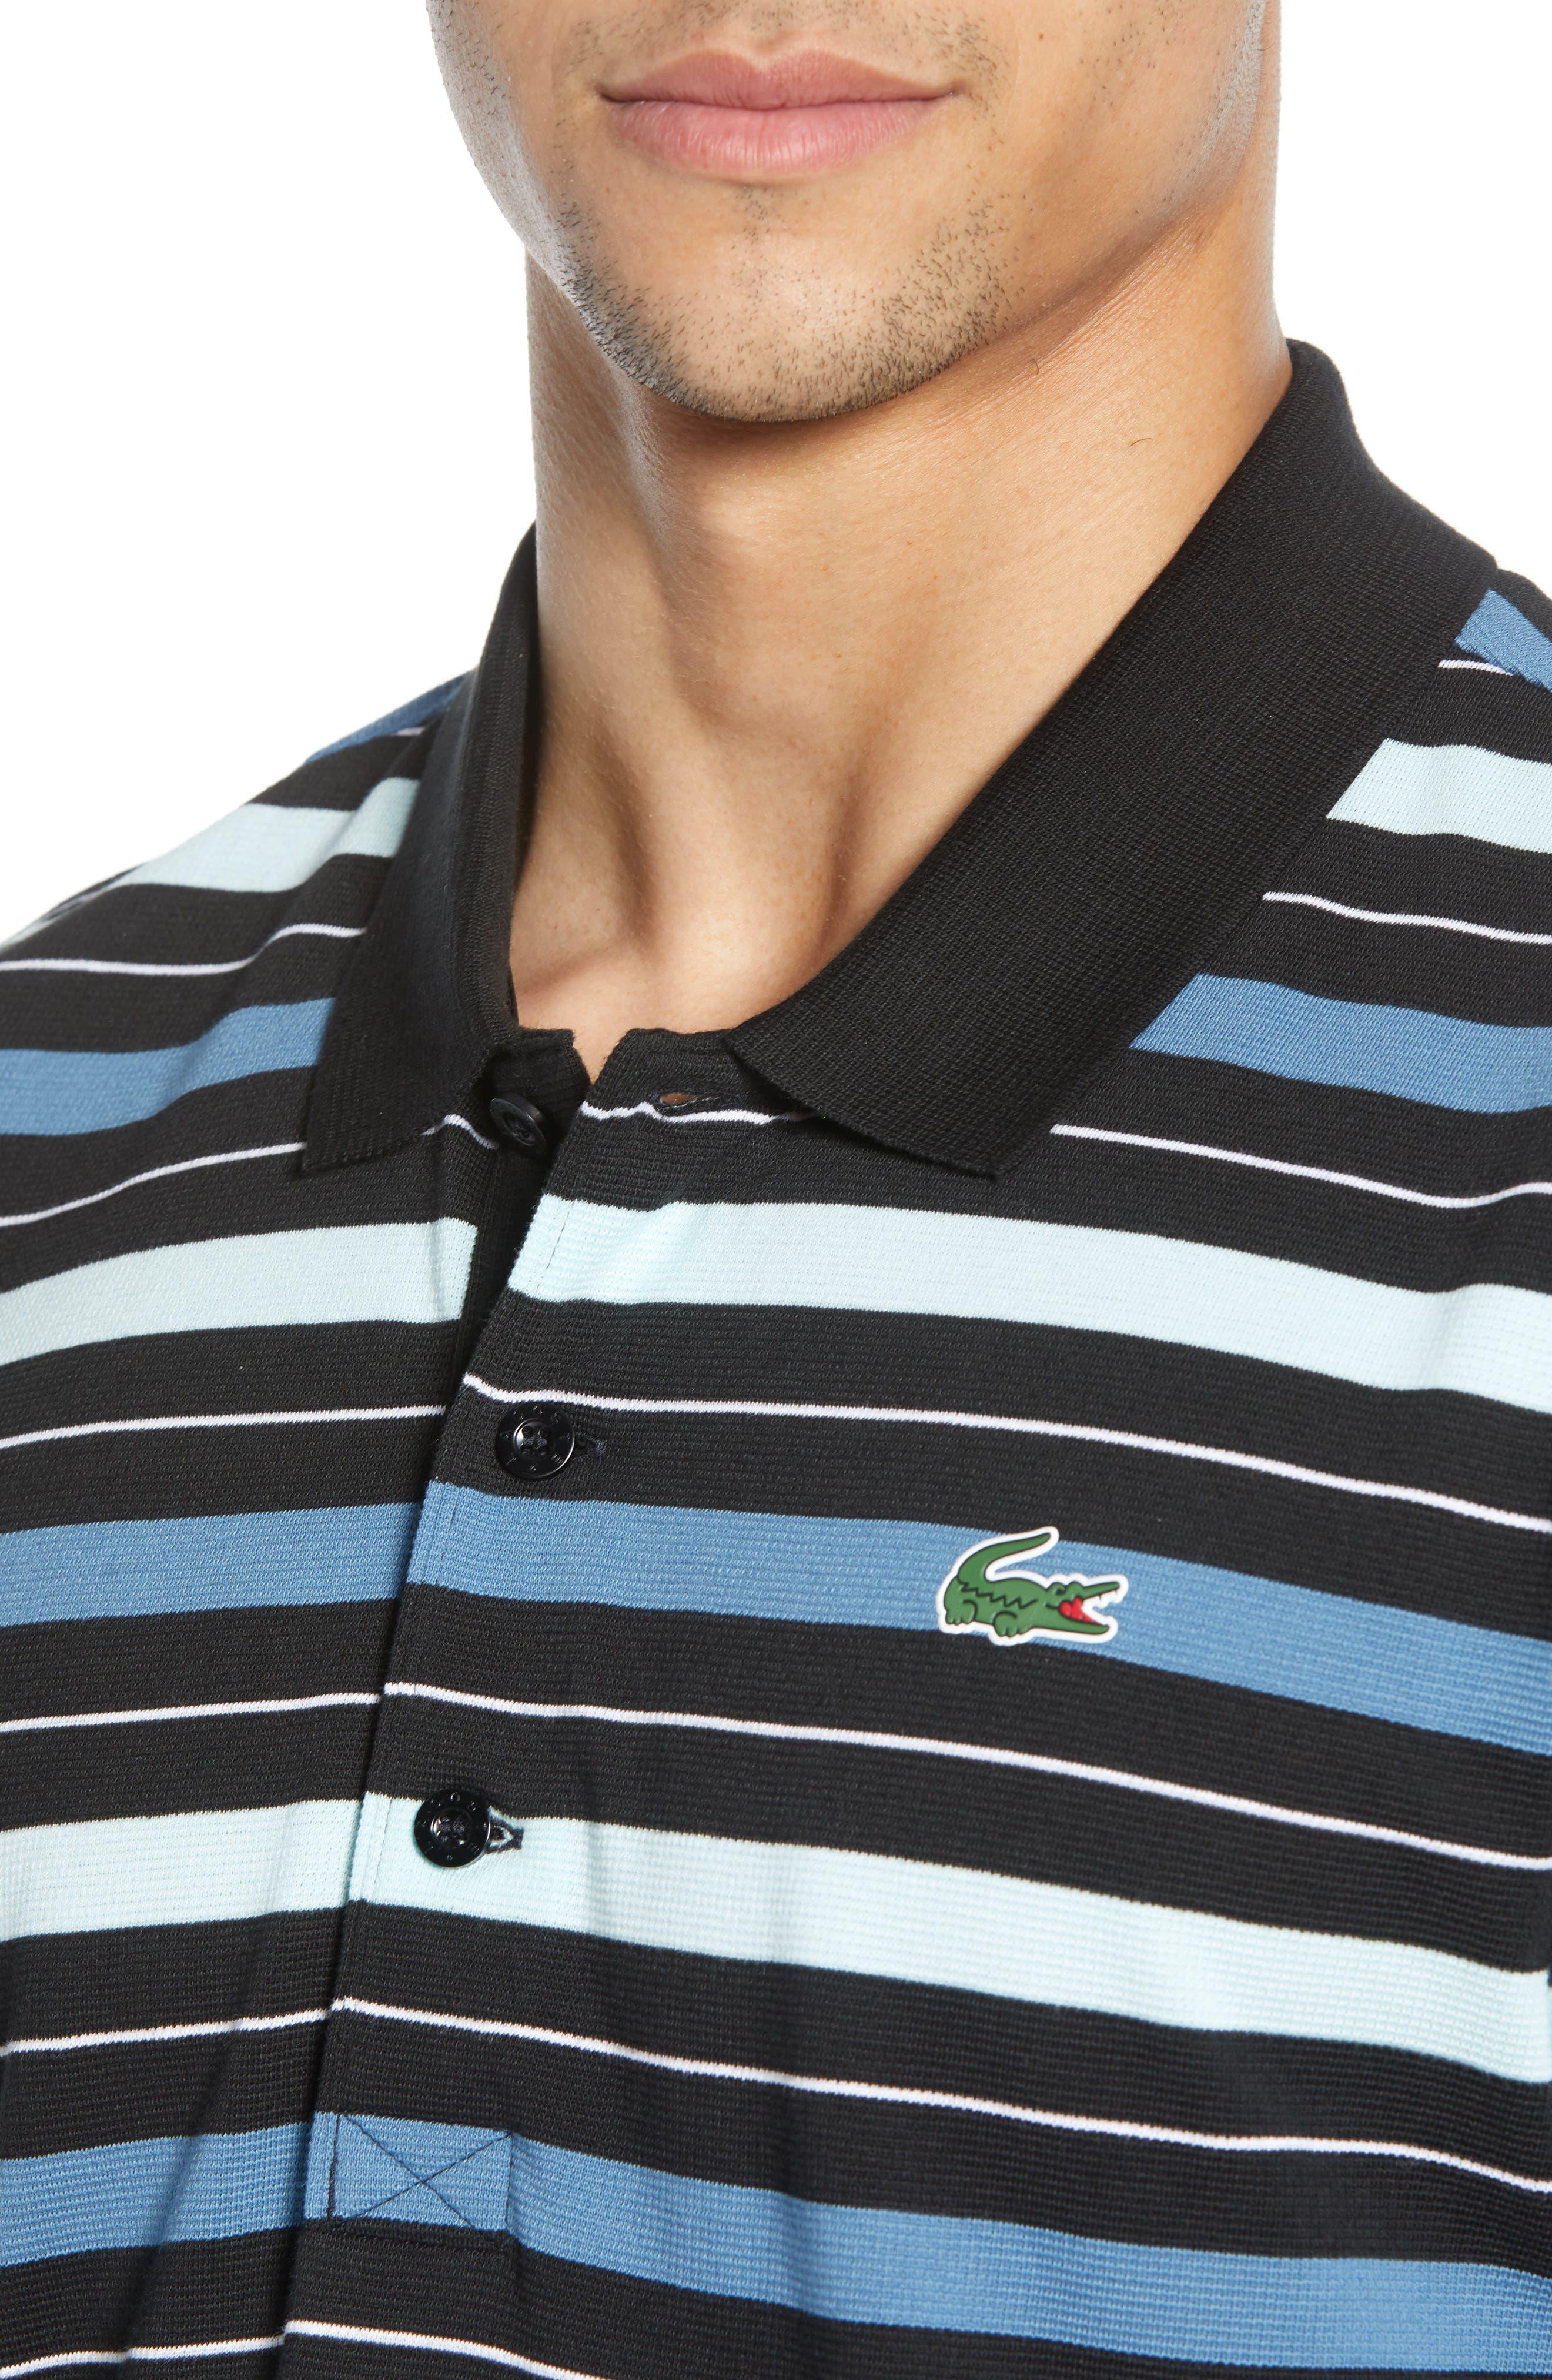 LACOSTE, Super Light Stripe Piqué Polo, Alternate thumbnail 4, color, BLACK/ AQUARIUM-WHITE-NEOTTIA